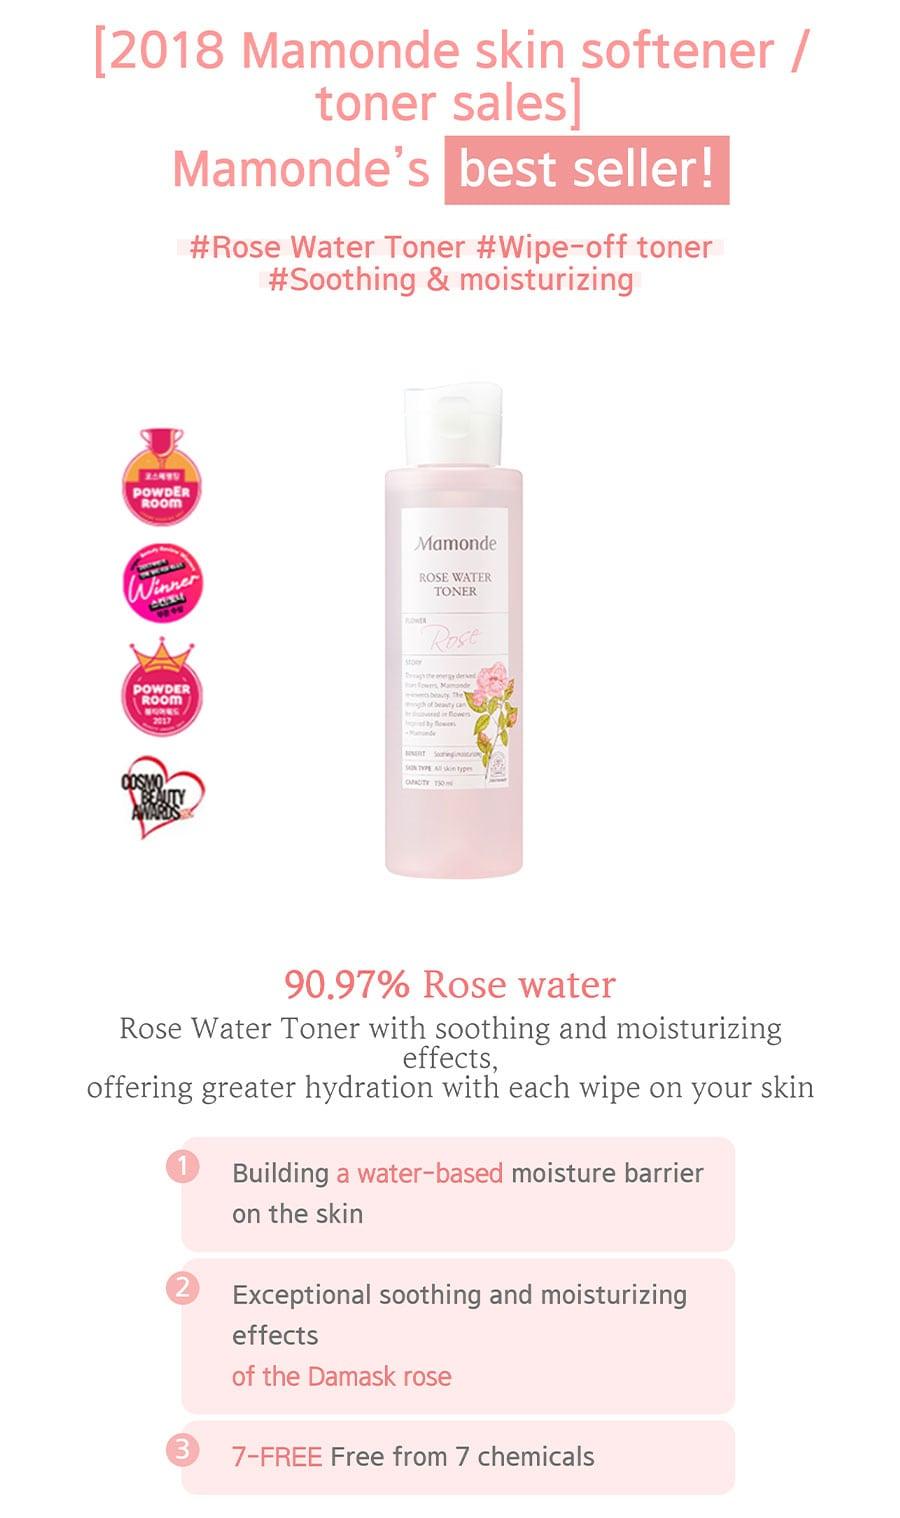 Rose Water Toner - Best Seller